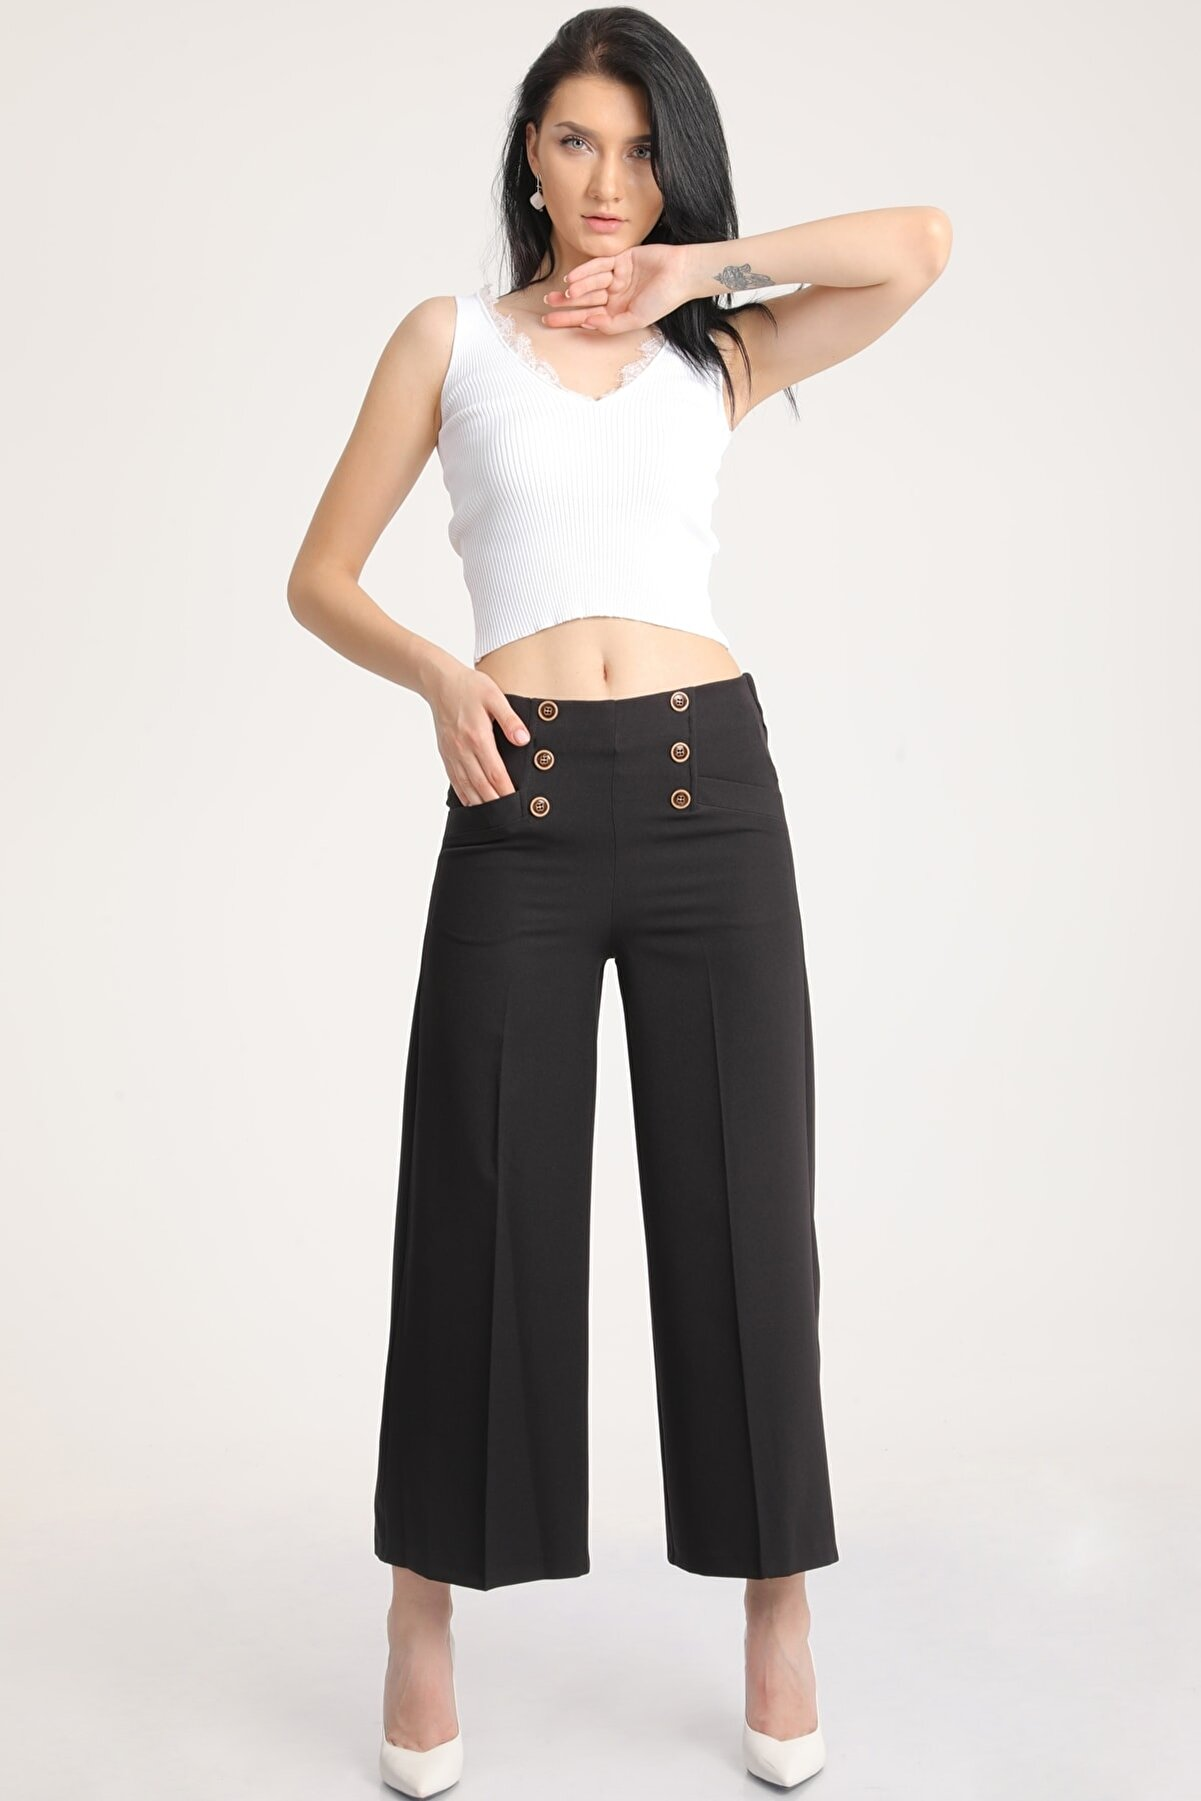 MD trend Kadın Siyah Geniş Paça Kapri Pantolon Mdt5729